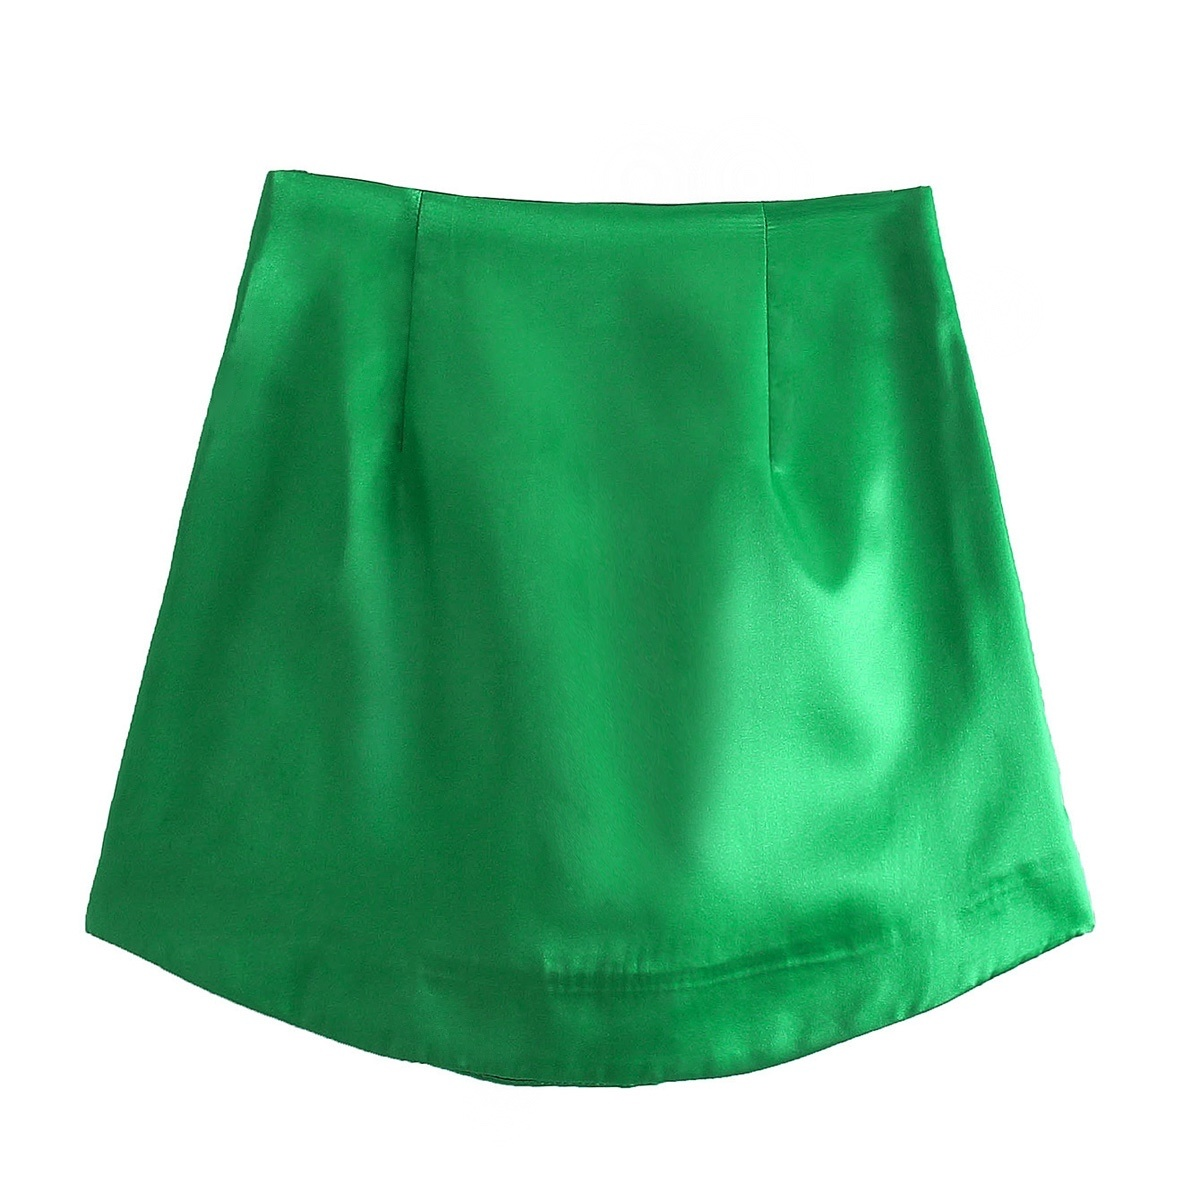 Zevity Women High Street Solid Color Side Zipper Sexy Mini Skirt Faldas Mujer Ladies Light Soft Casual Slim Chic Vestidos QUN765